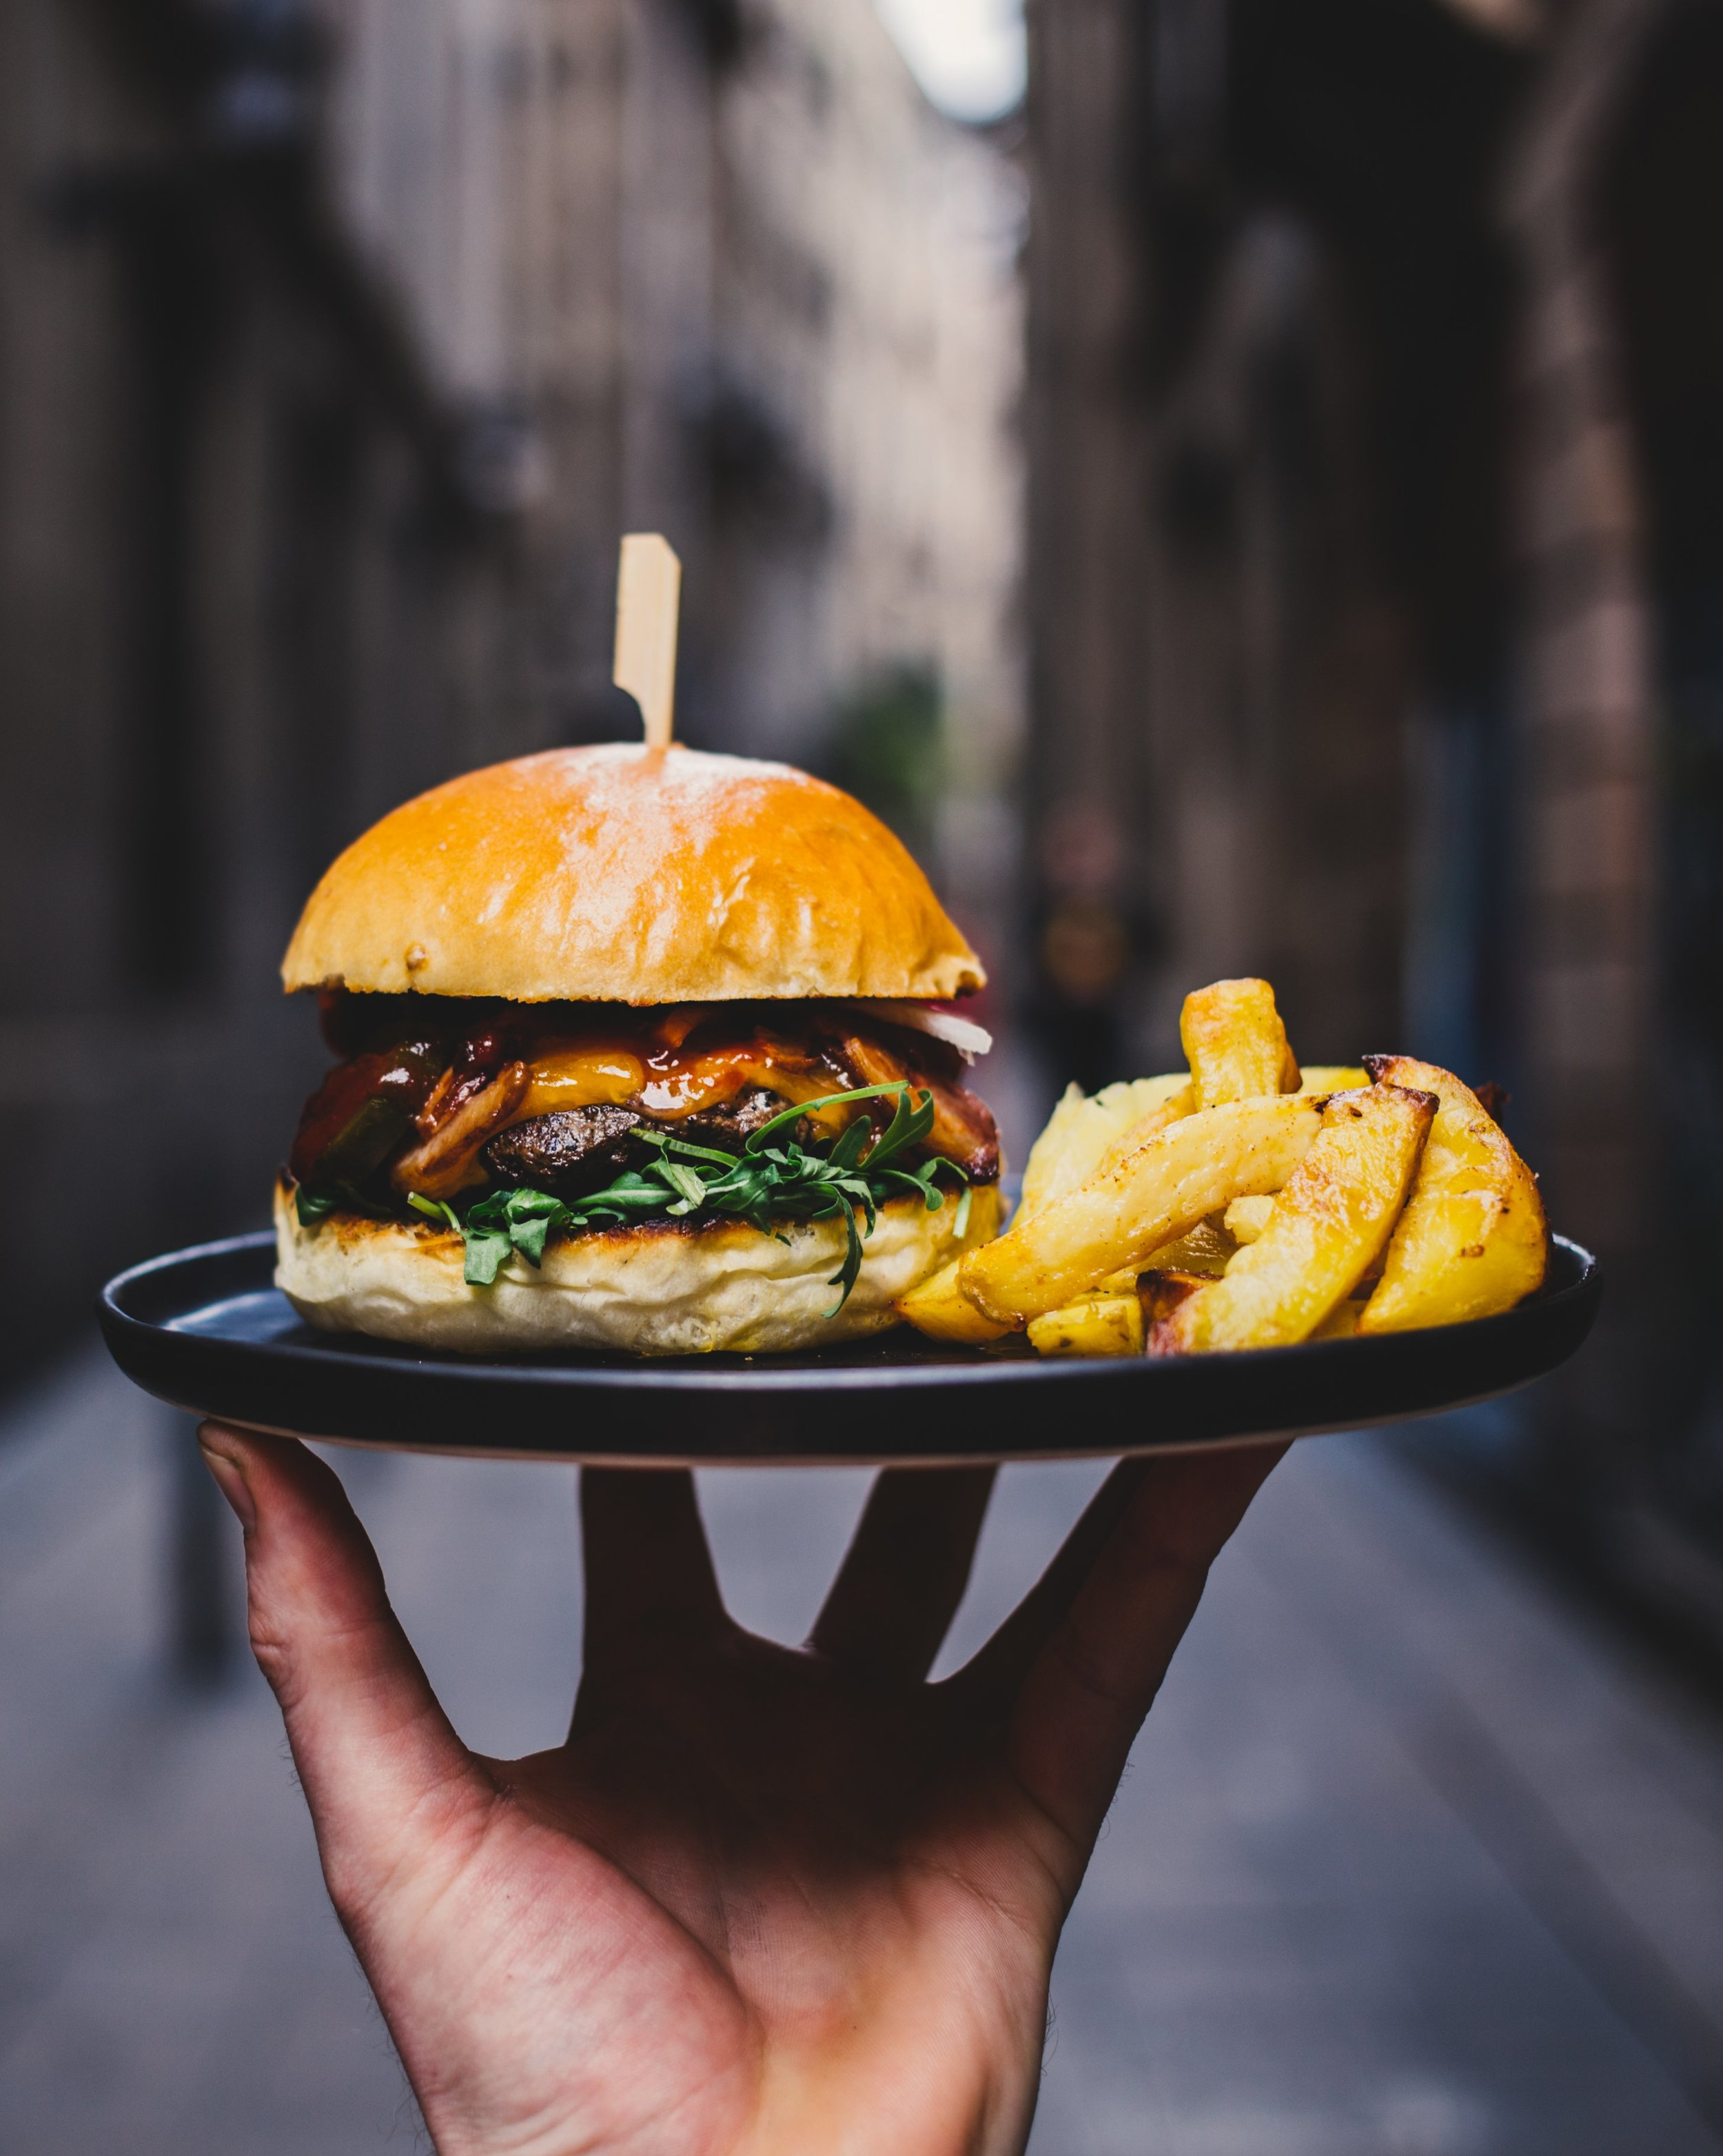 hamburger-and-fries_4460x4460.jpg